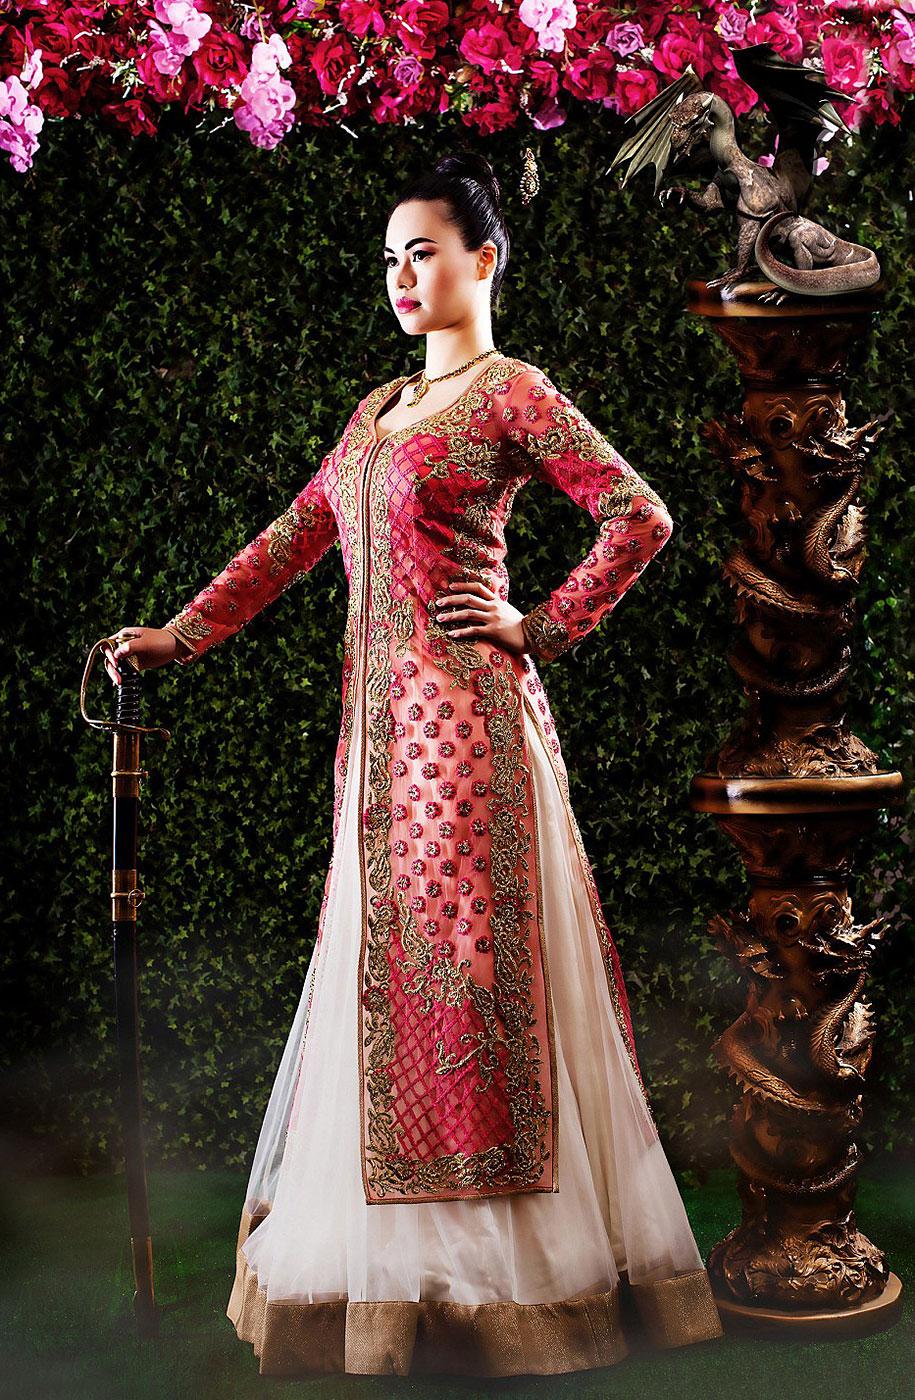 disney-princess-bride-india-wedding-photography-amrit-grewal-5